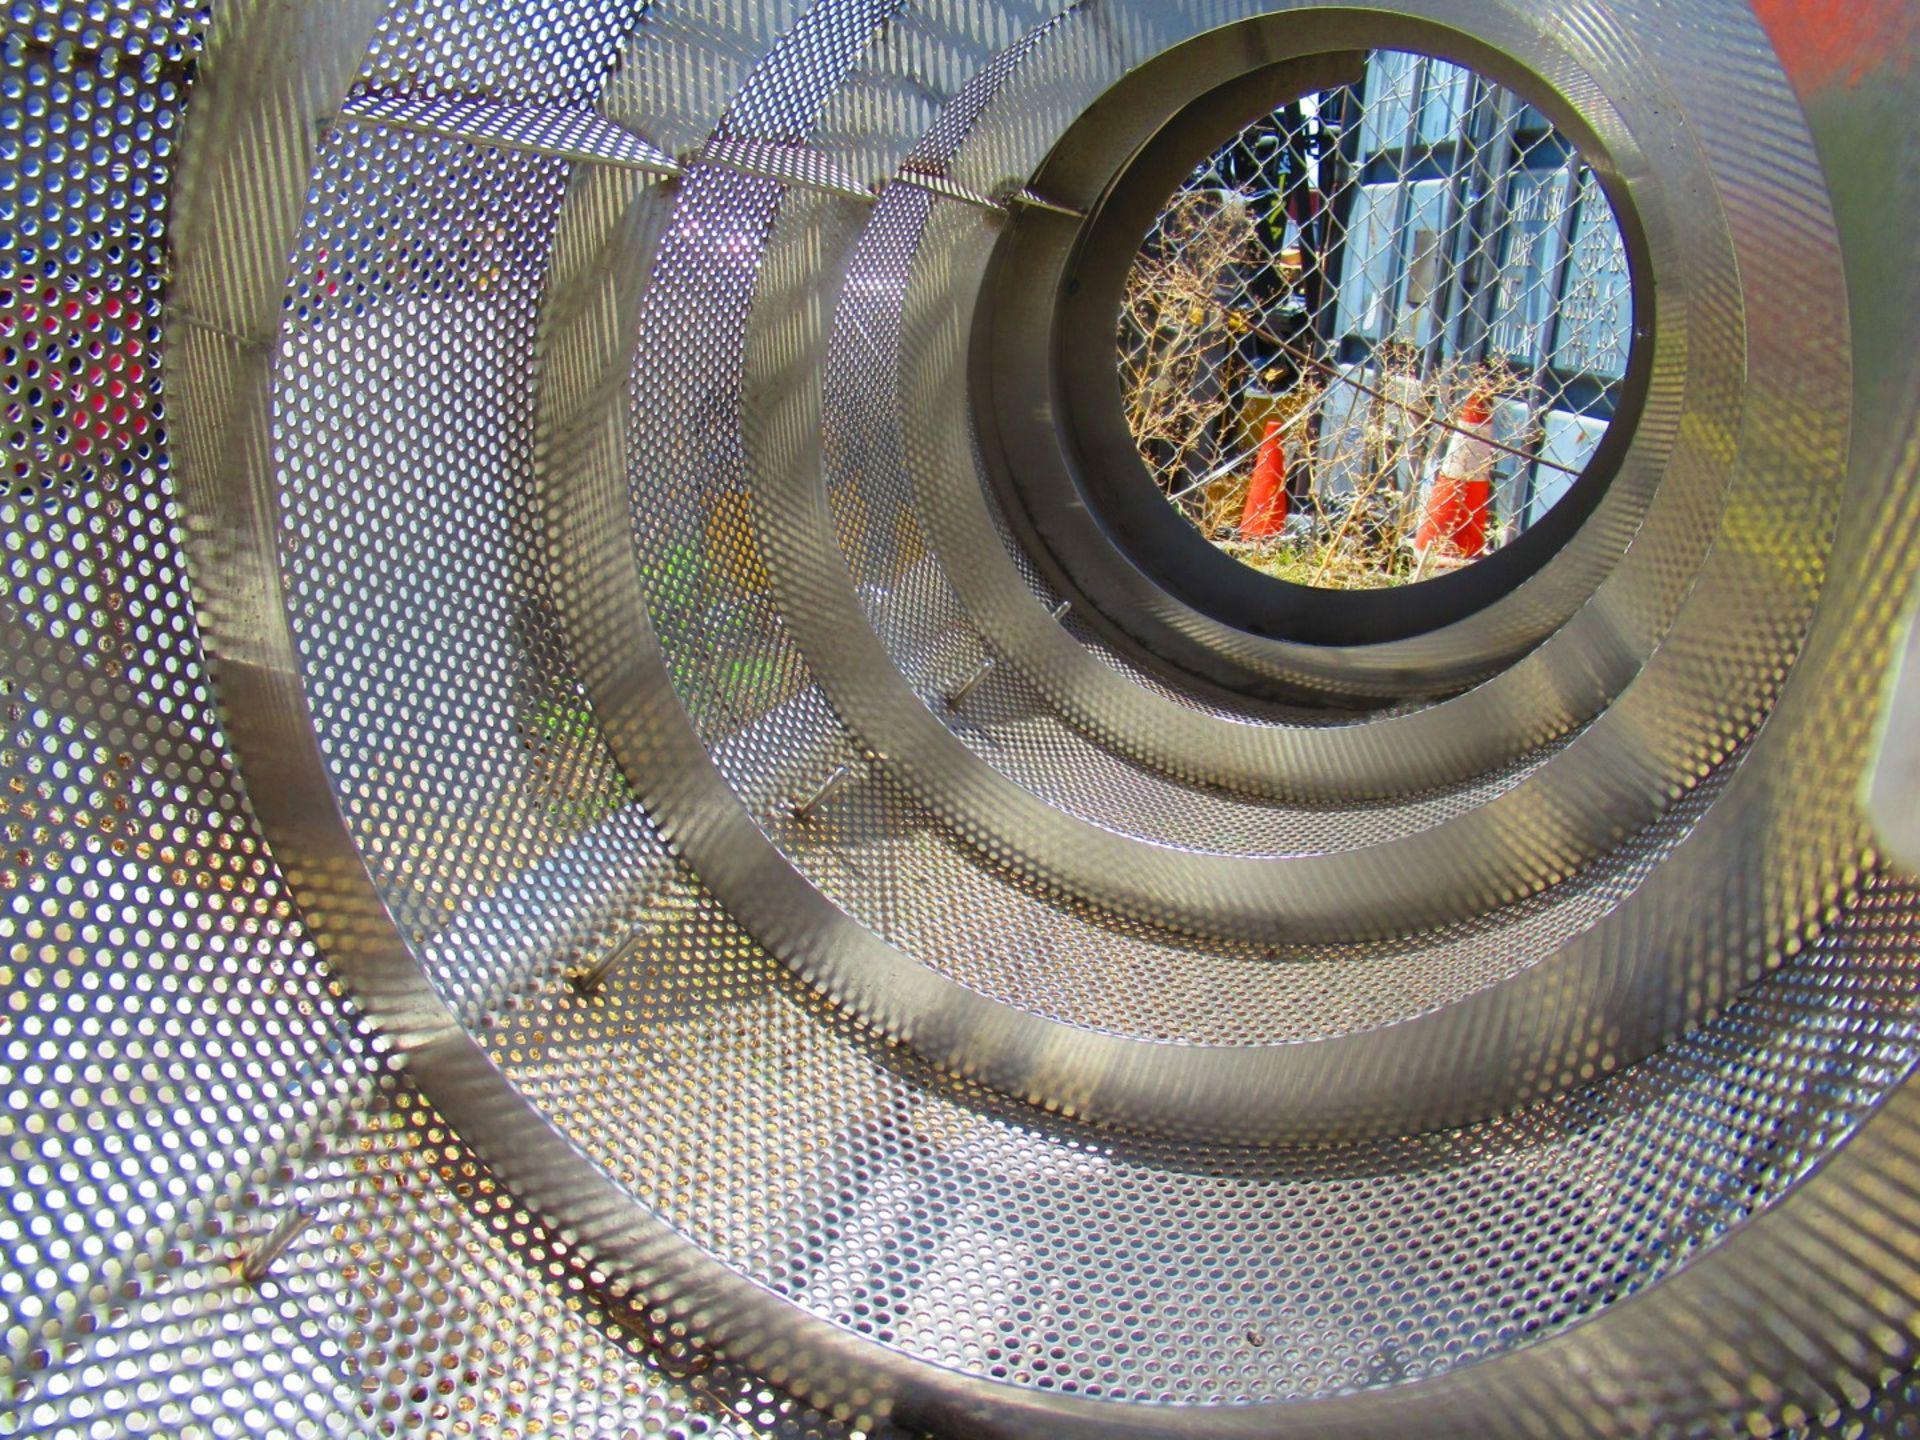 Rotary Screen Tumbler - Image 3 of 4